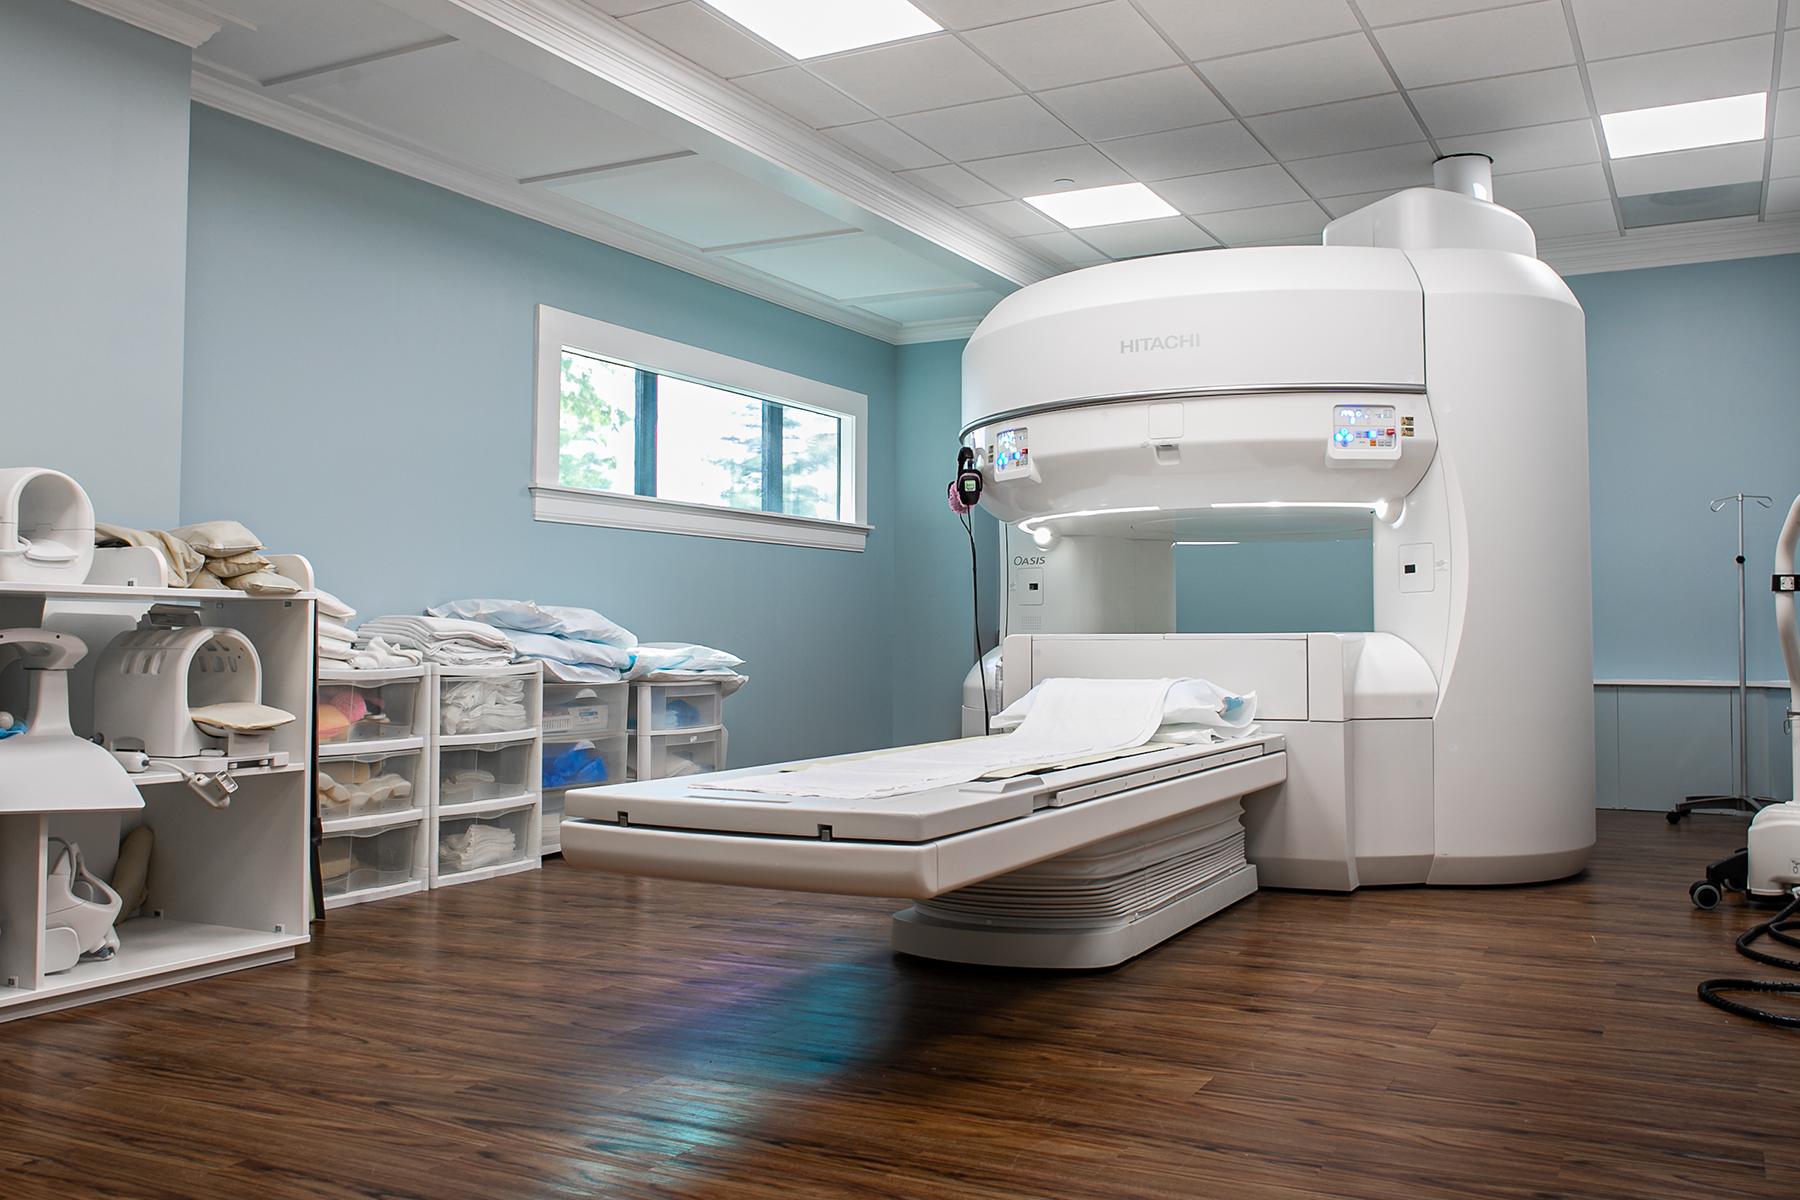 Open MRI machine OASIS